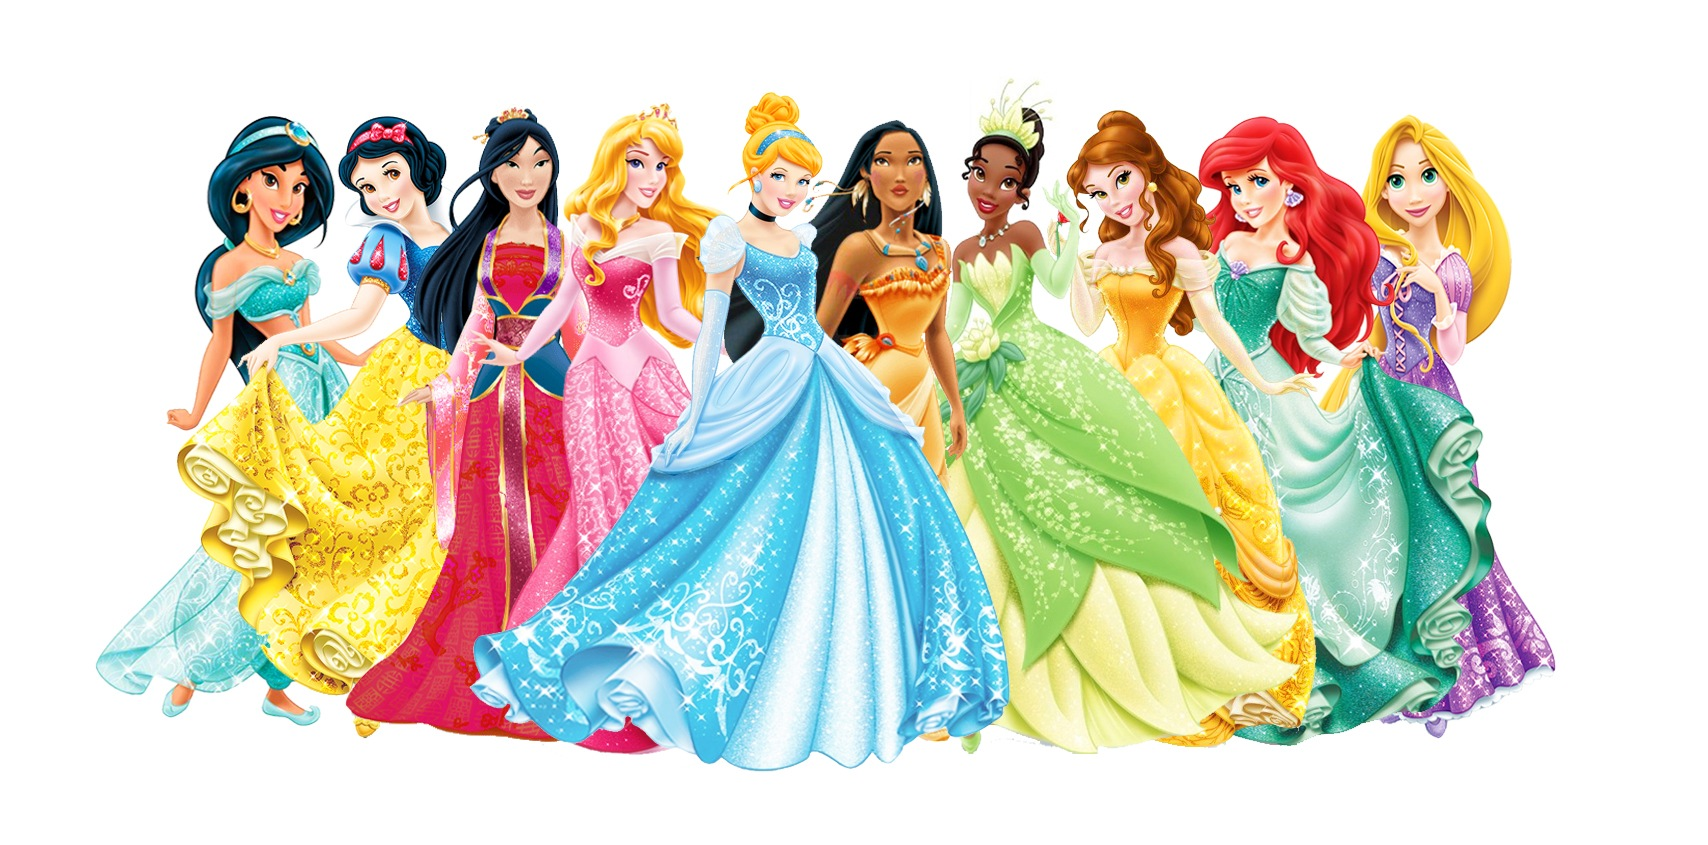 Nice wallpapers Disney Princesses 1708x845px